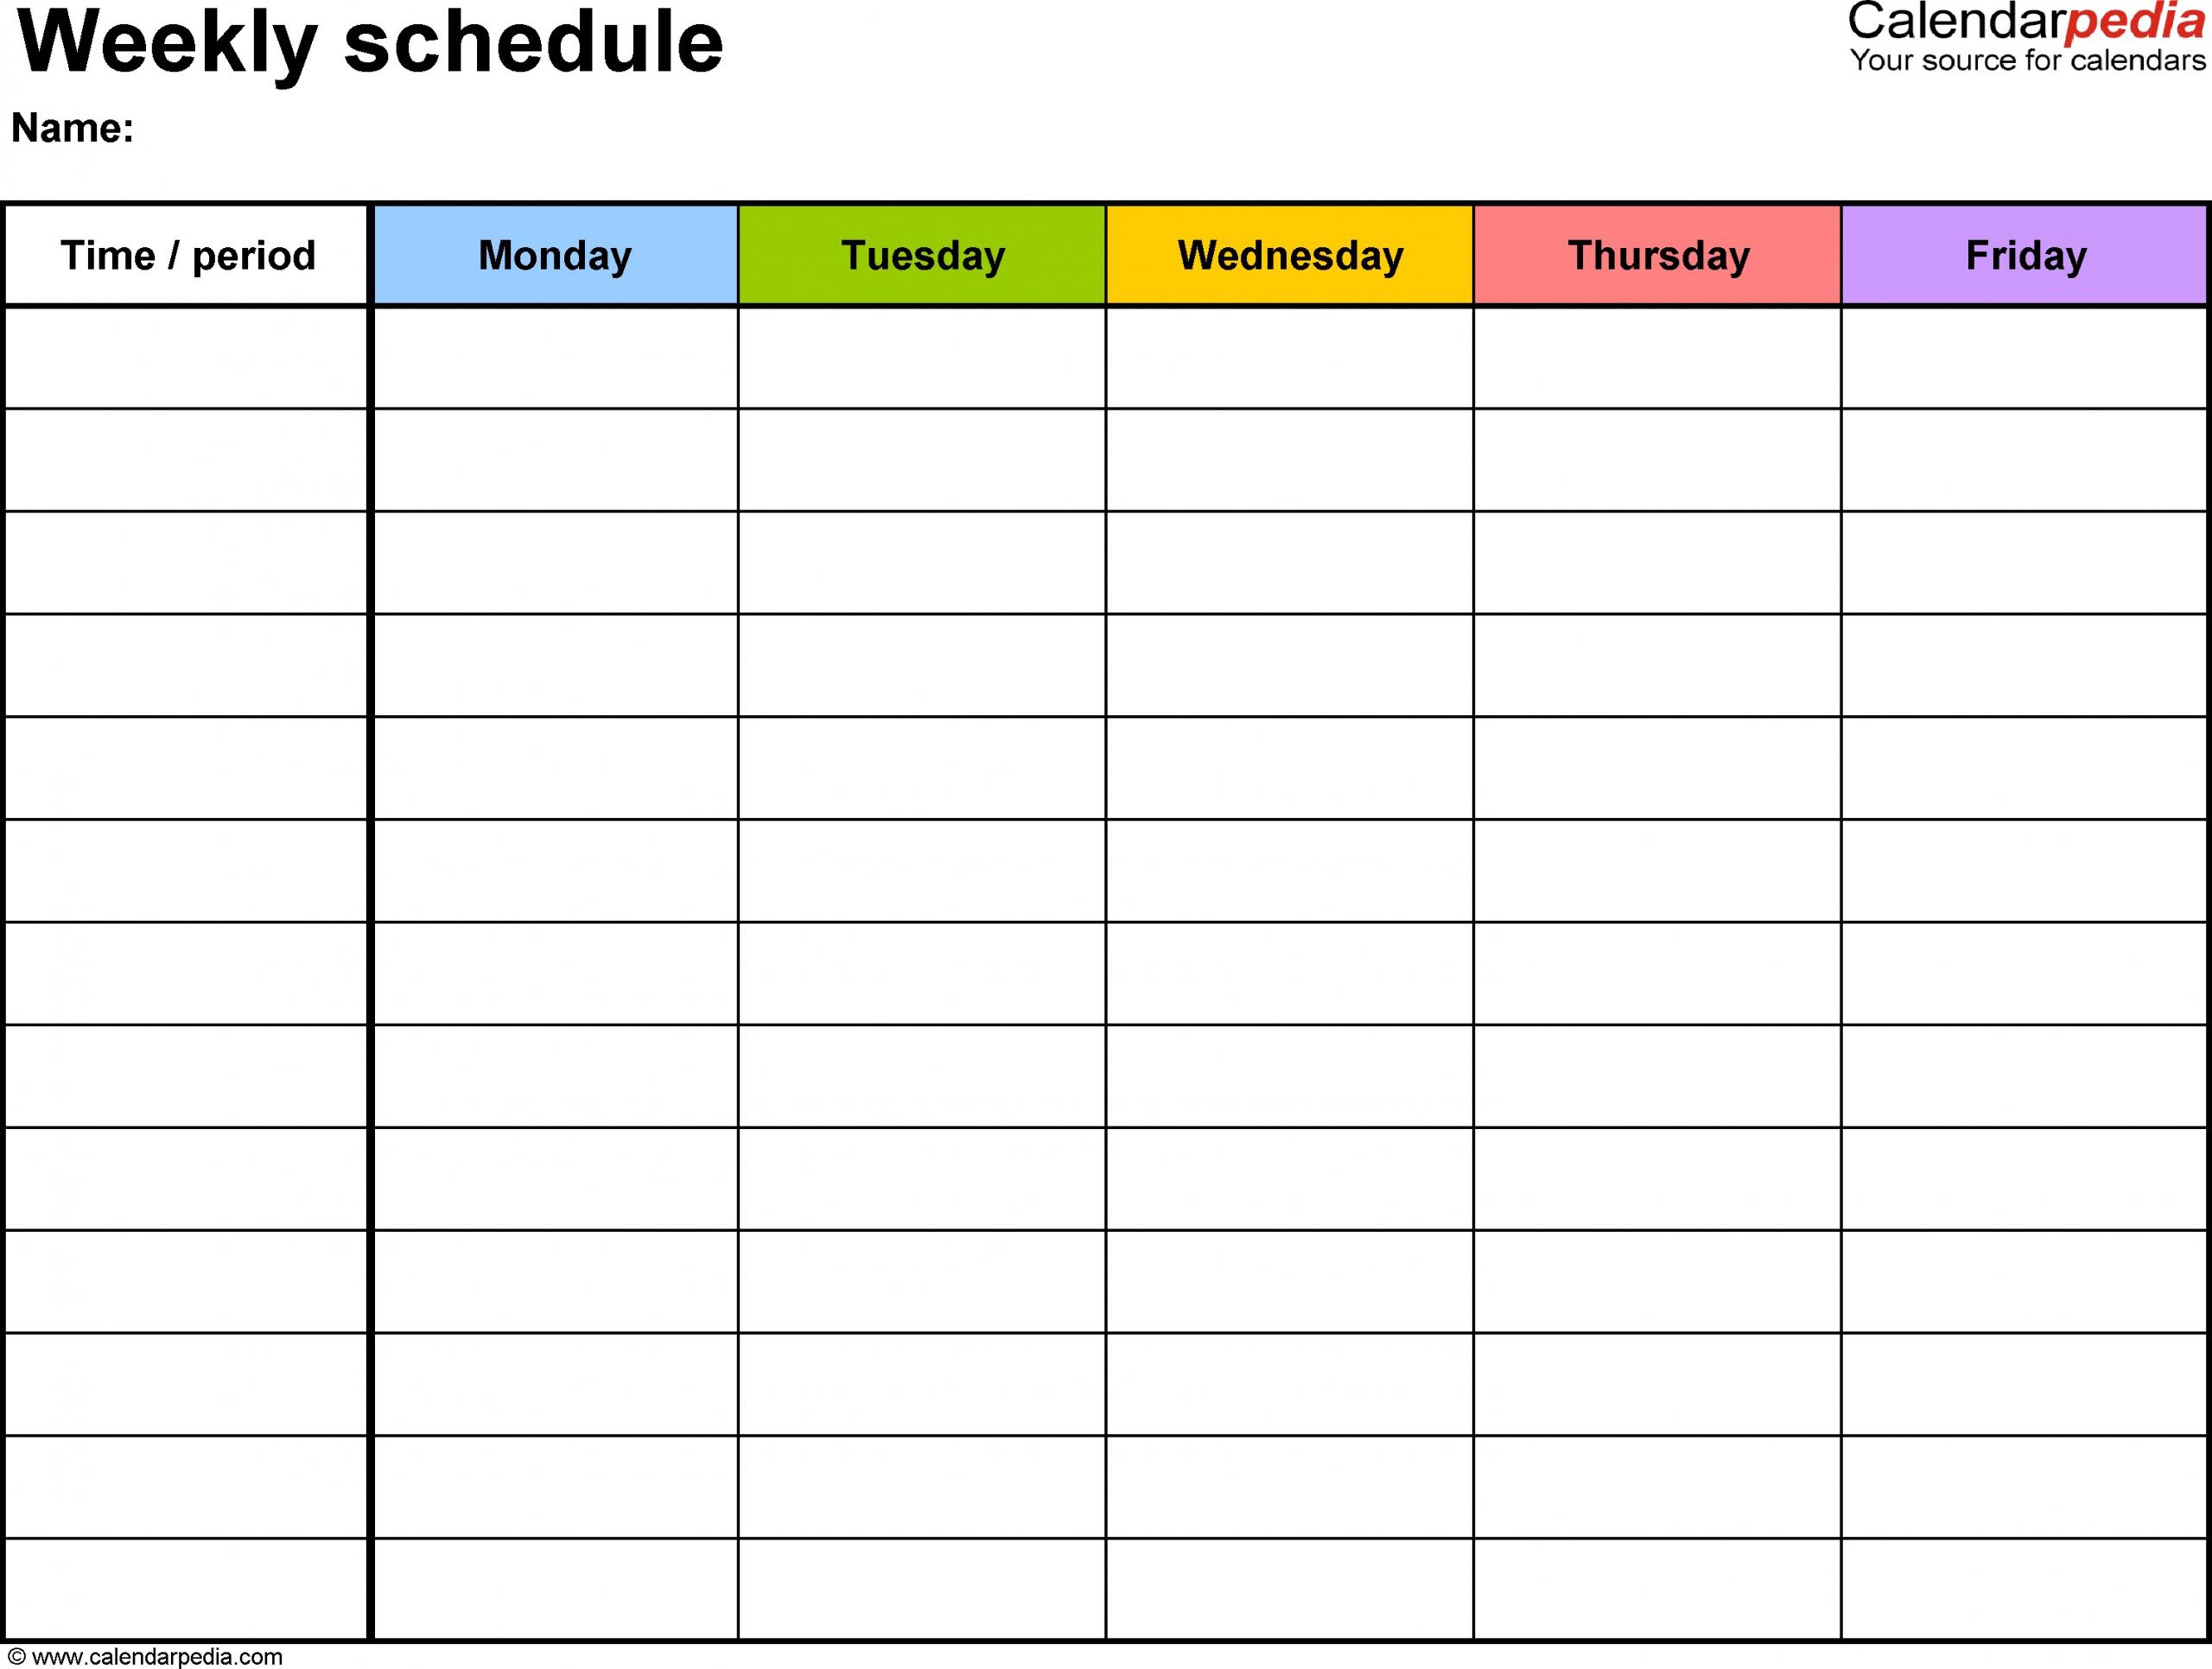 Macs 2019-2020 Calendar - Calendar Inspiration Design Monday Through Friday Calendar Monthly